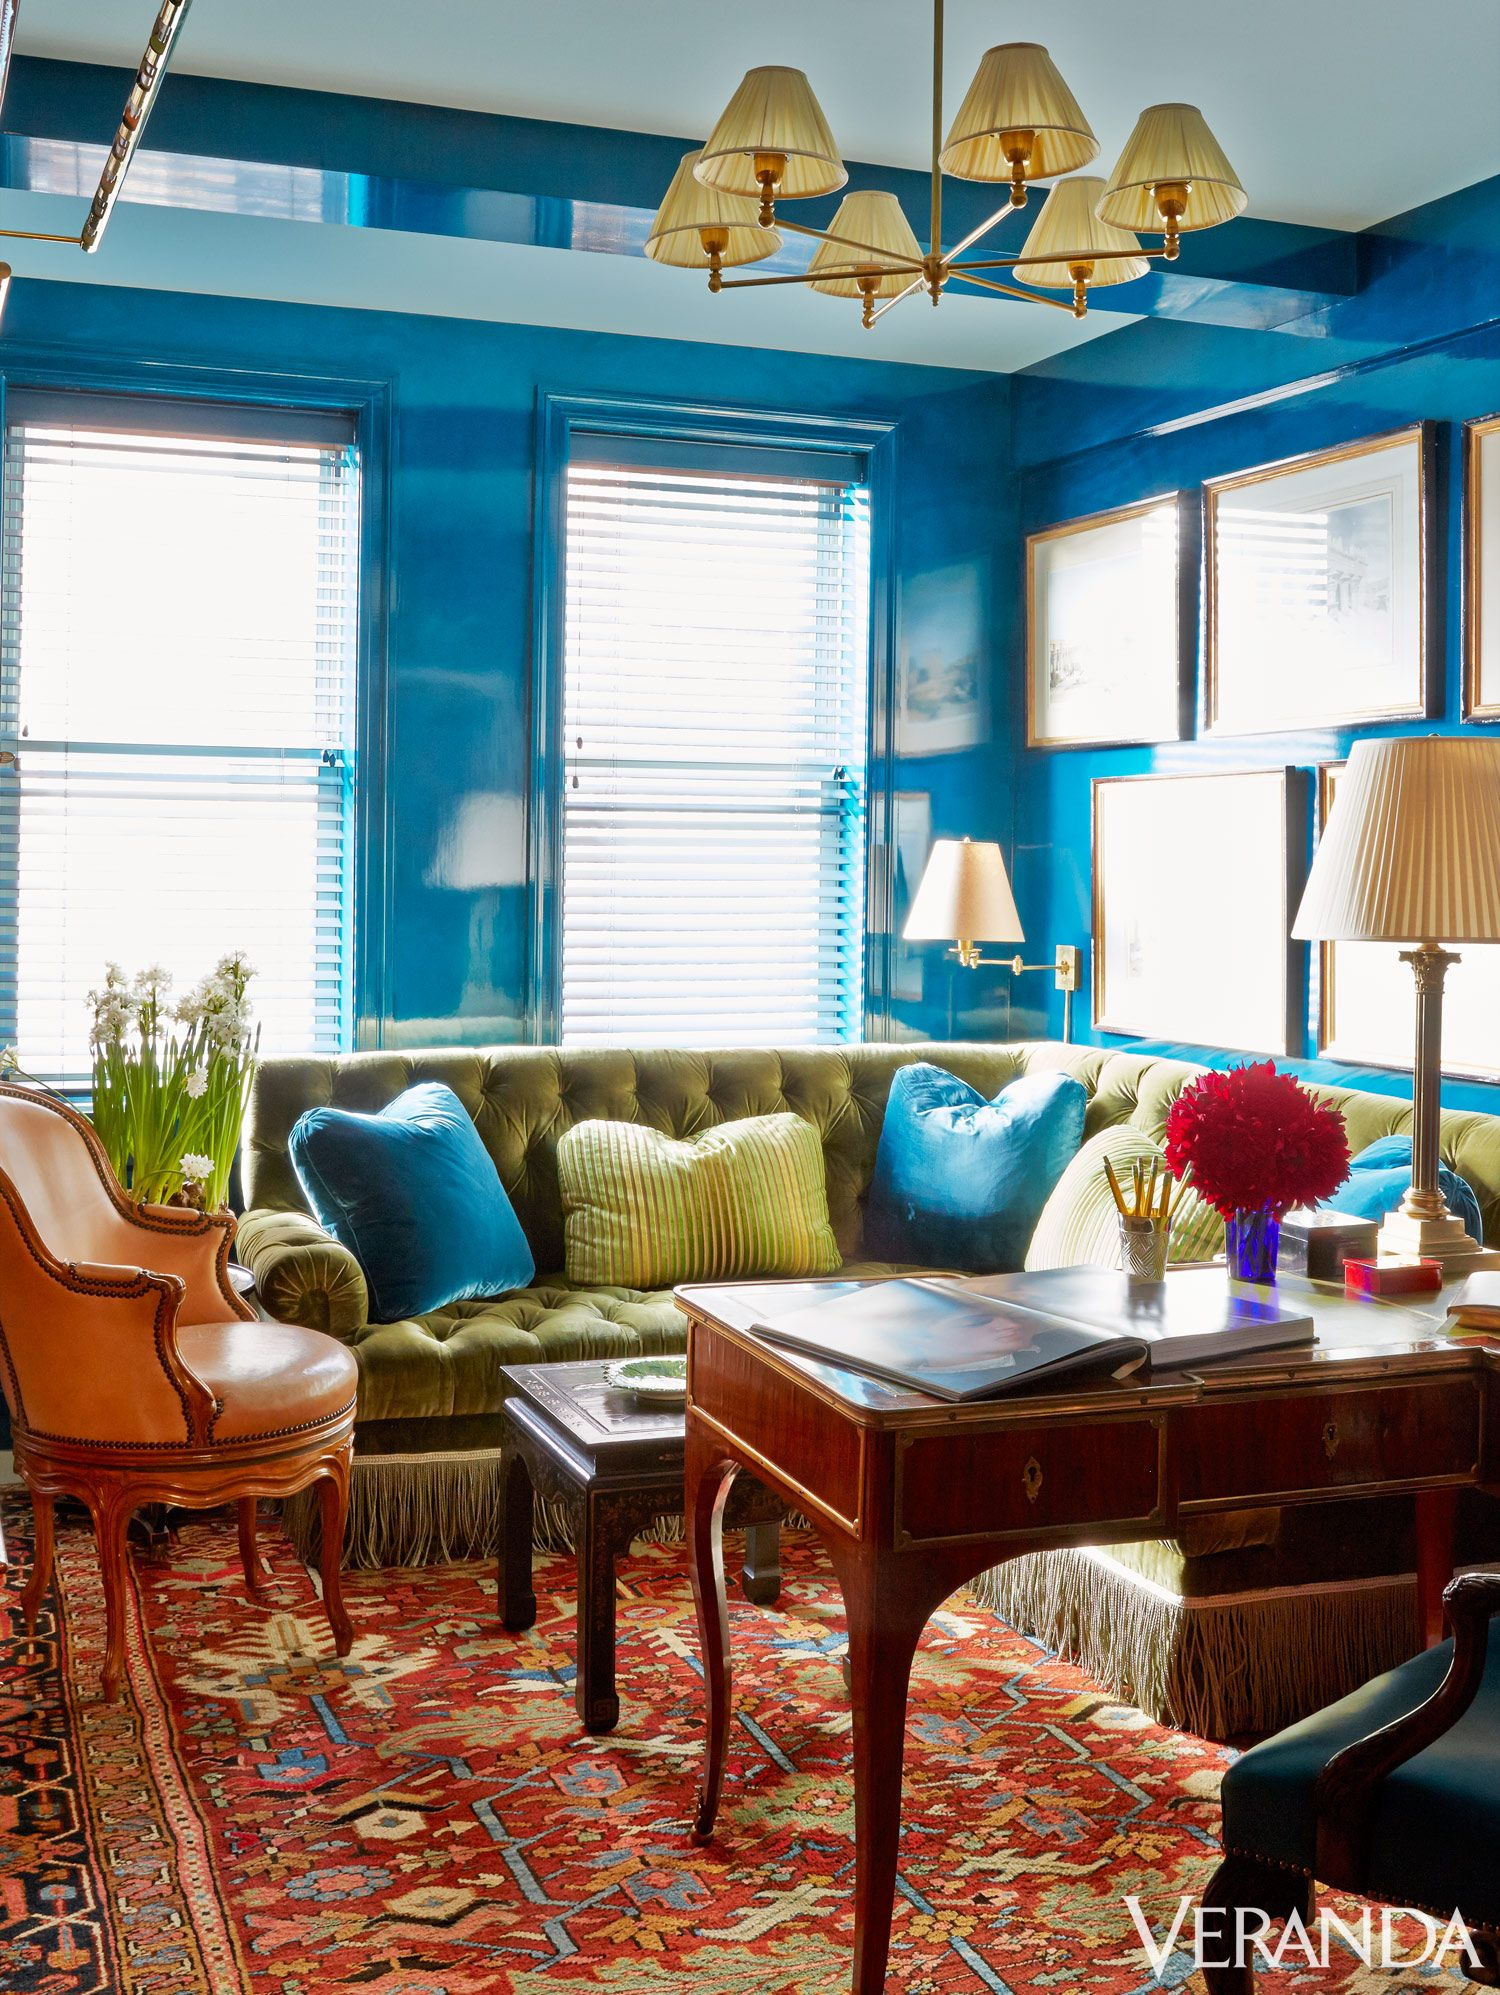 large sofa offers plenty of seating in the office bold new york city also veranda magazine verandamag on pinterest rh